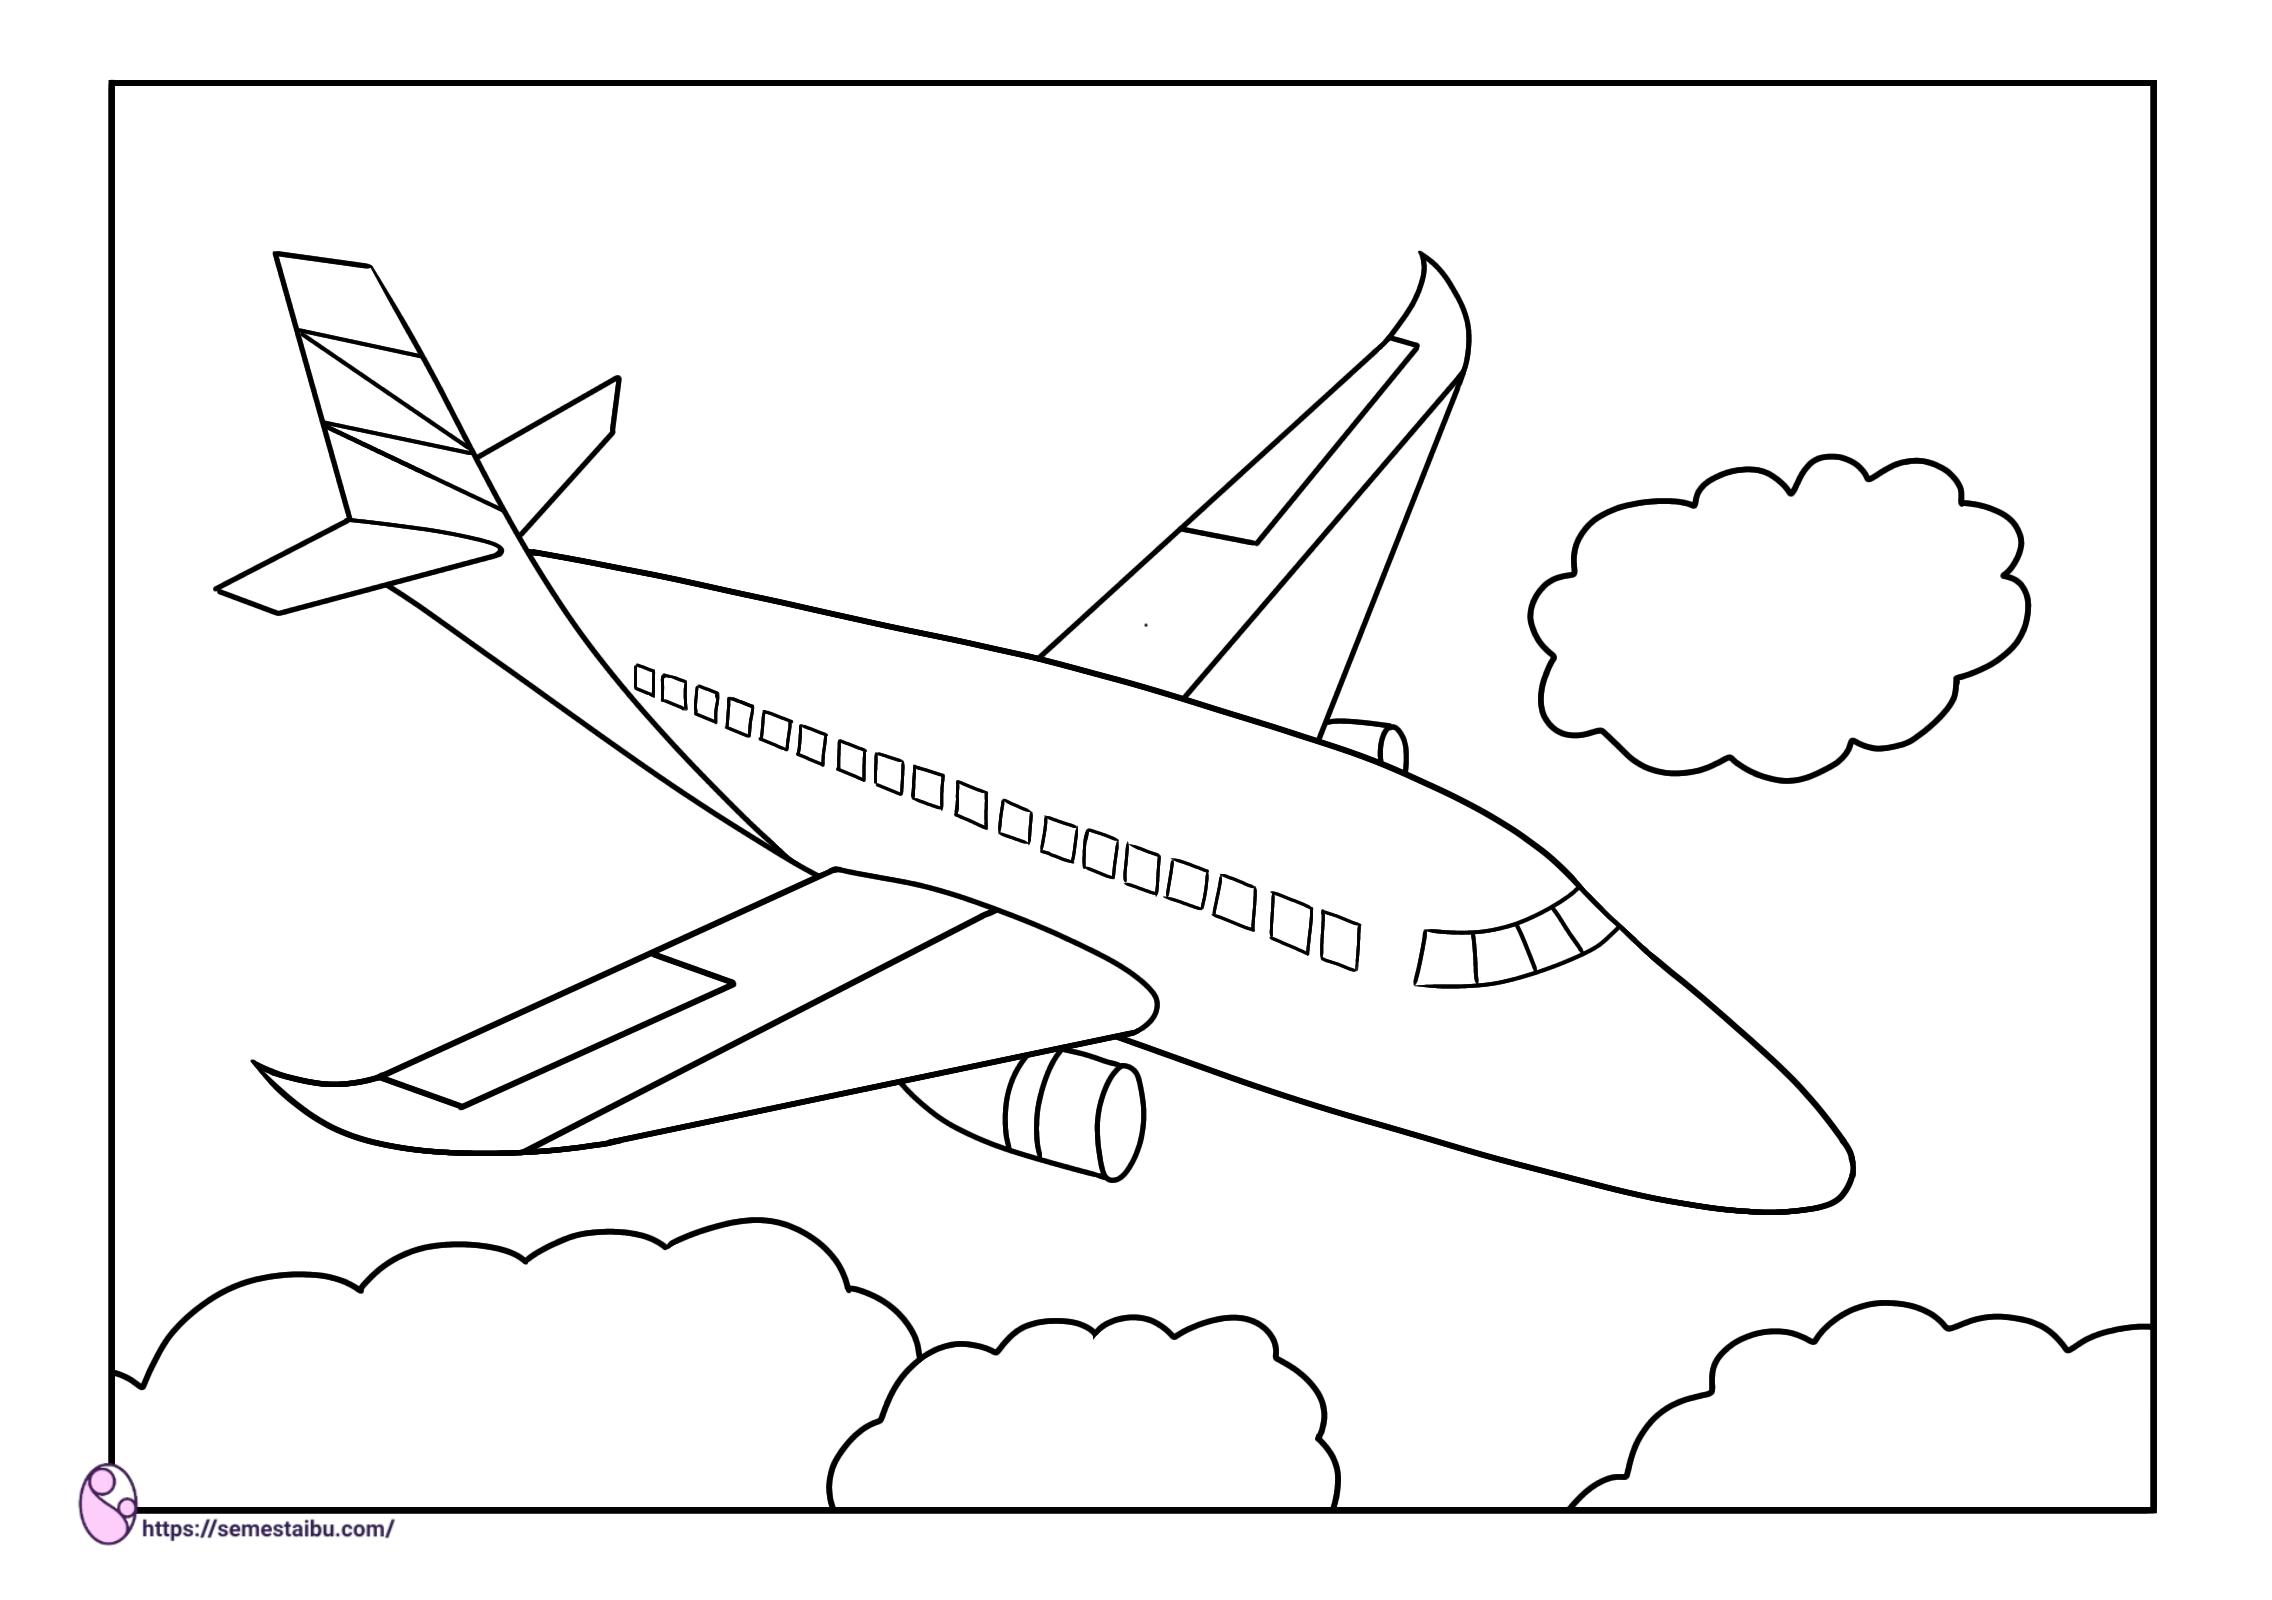 Gambar mewarnai - pesawat - kendaraan